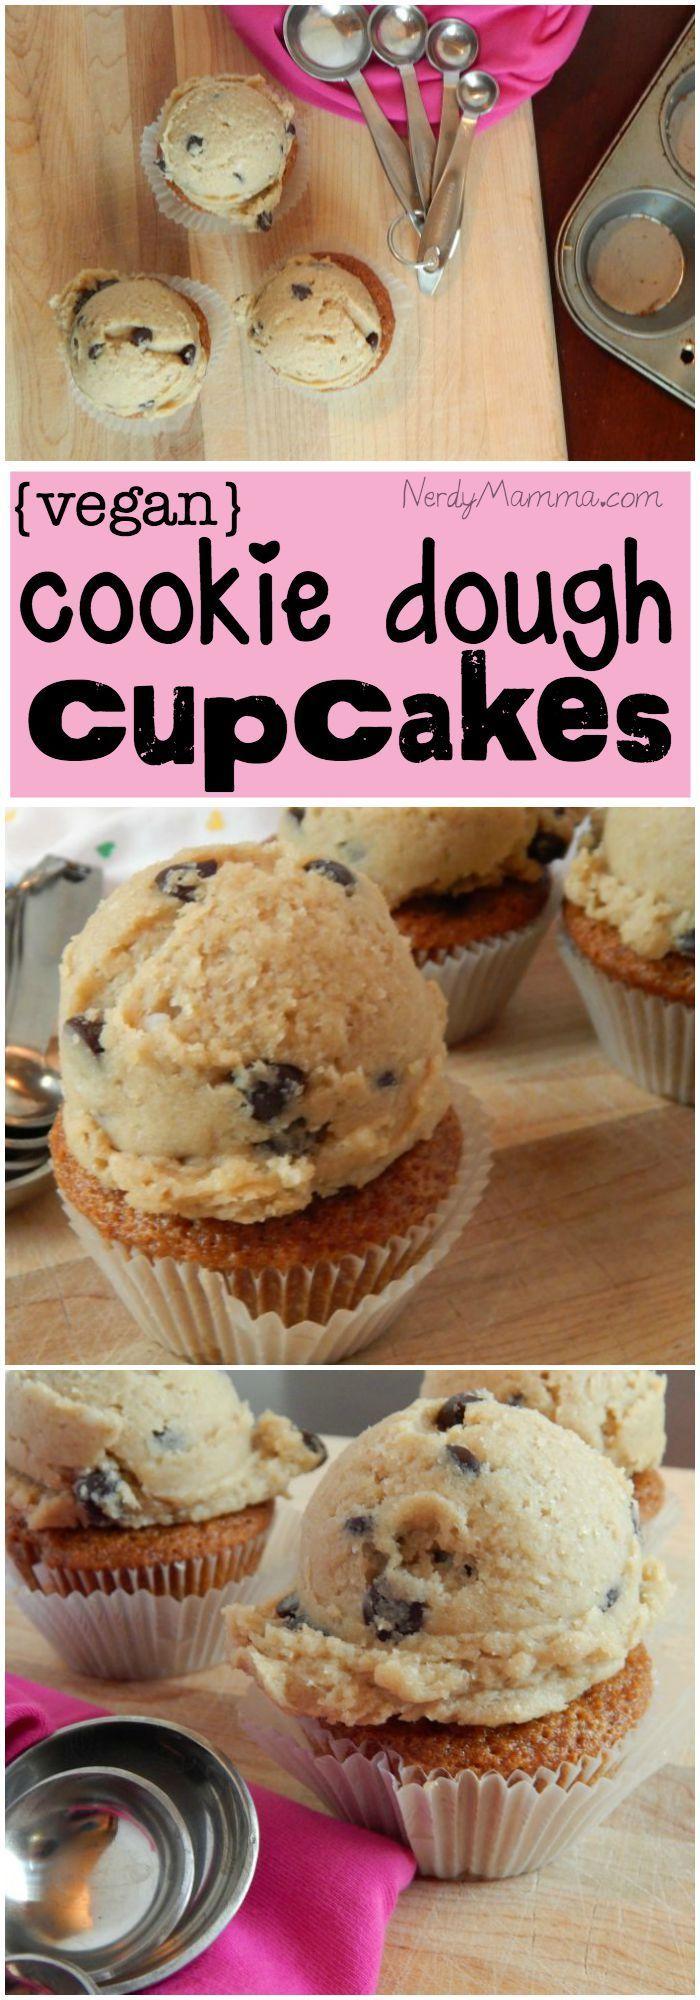 how to make egg free cupcakes